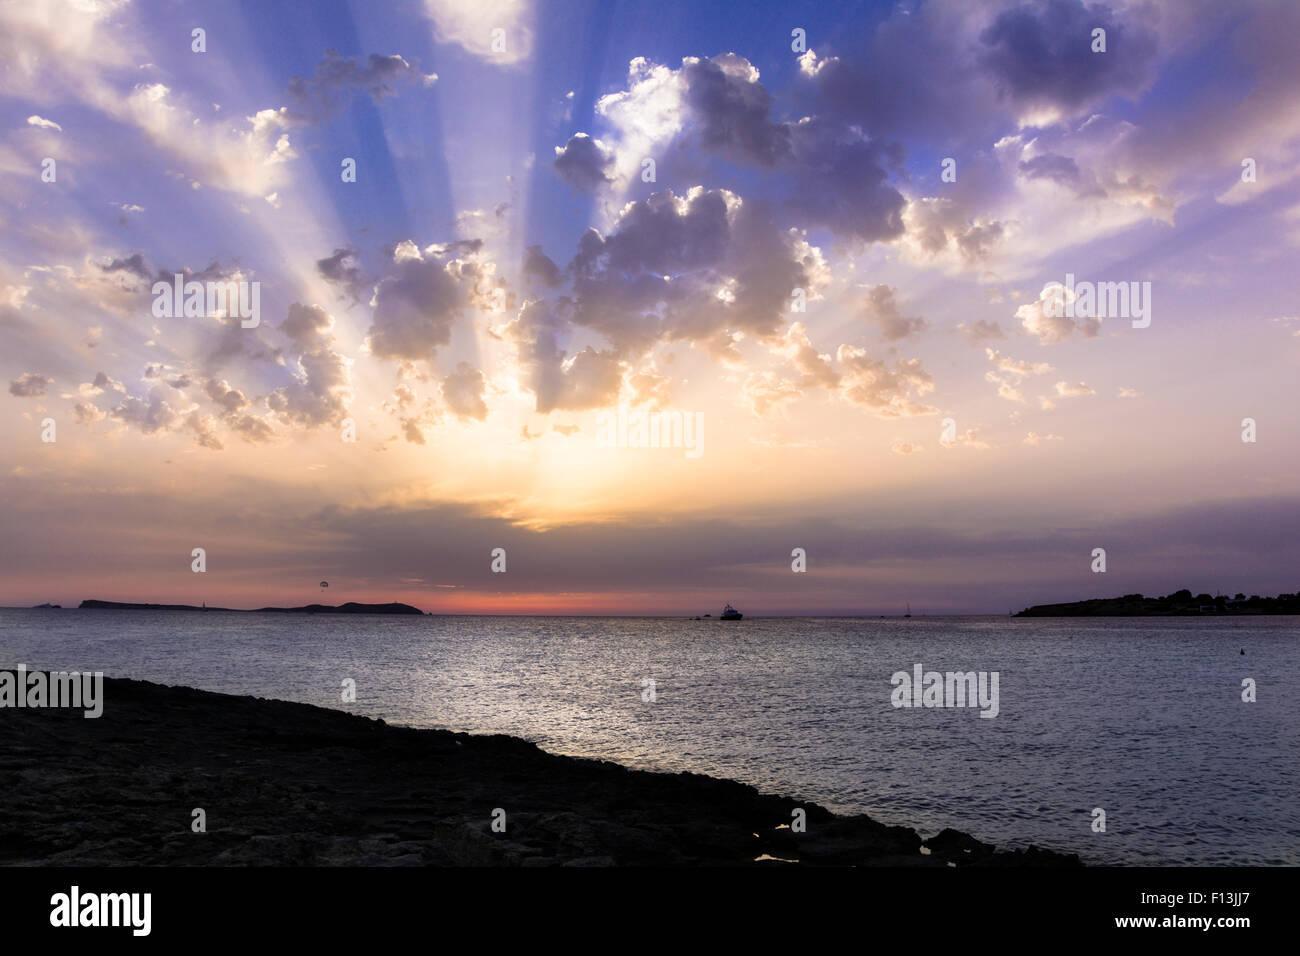 Rocky Beach at Sunset - Stock Image